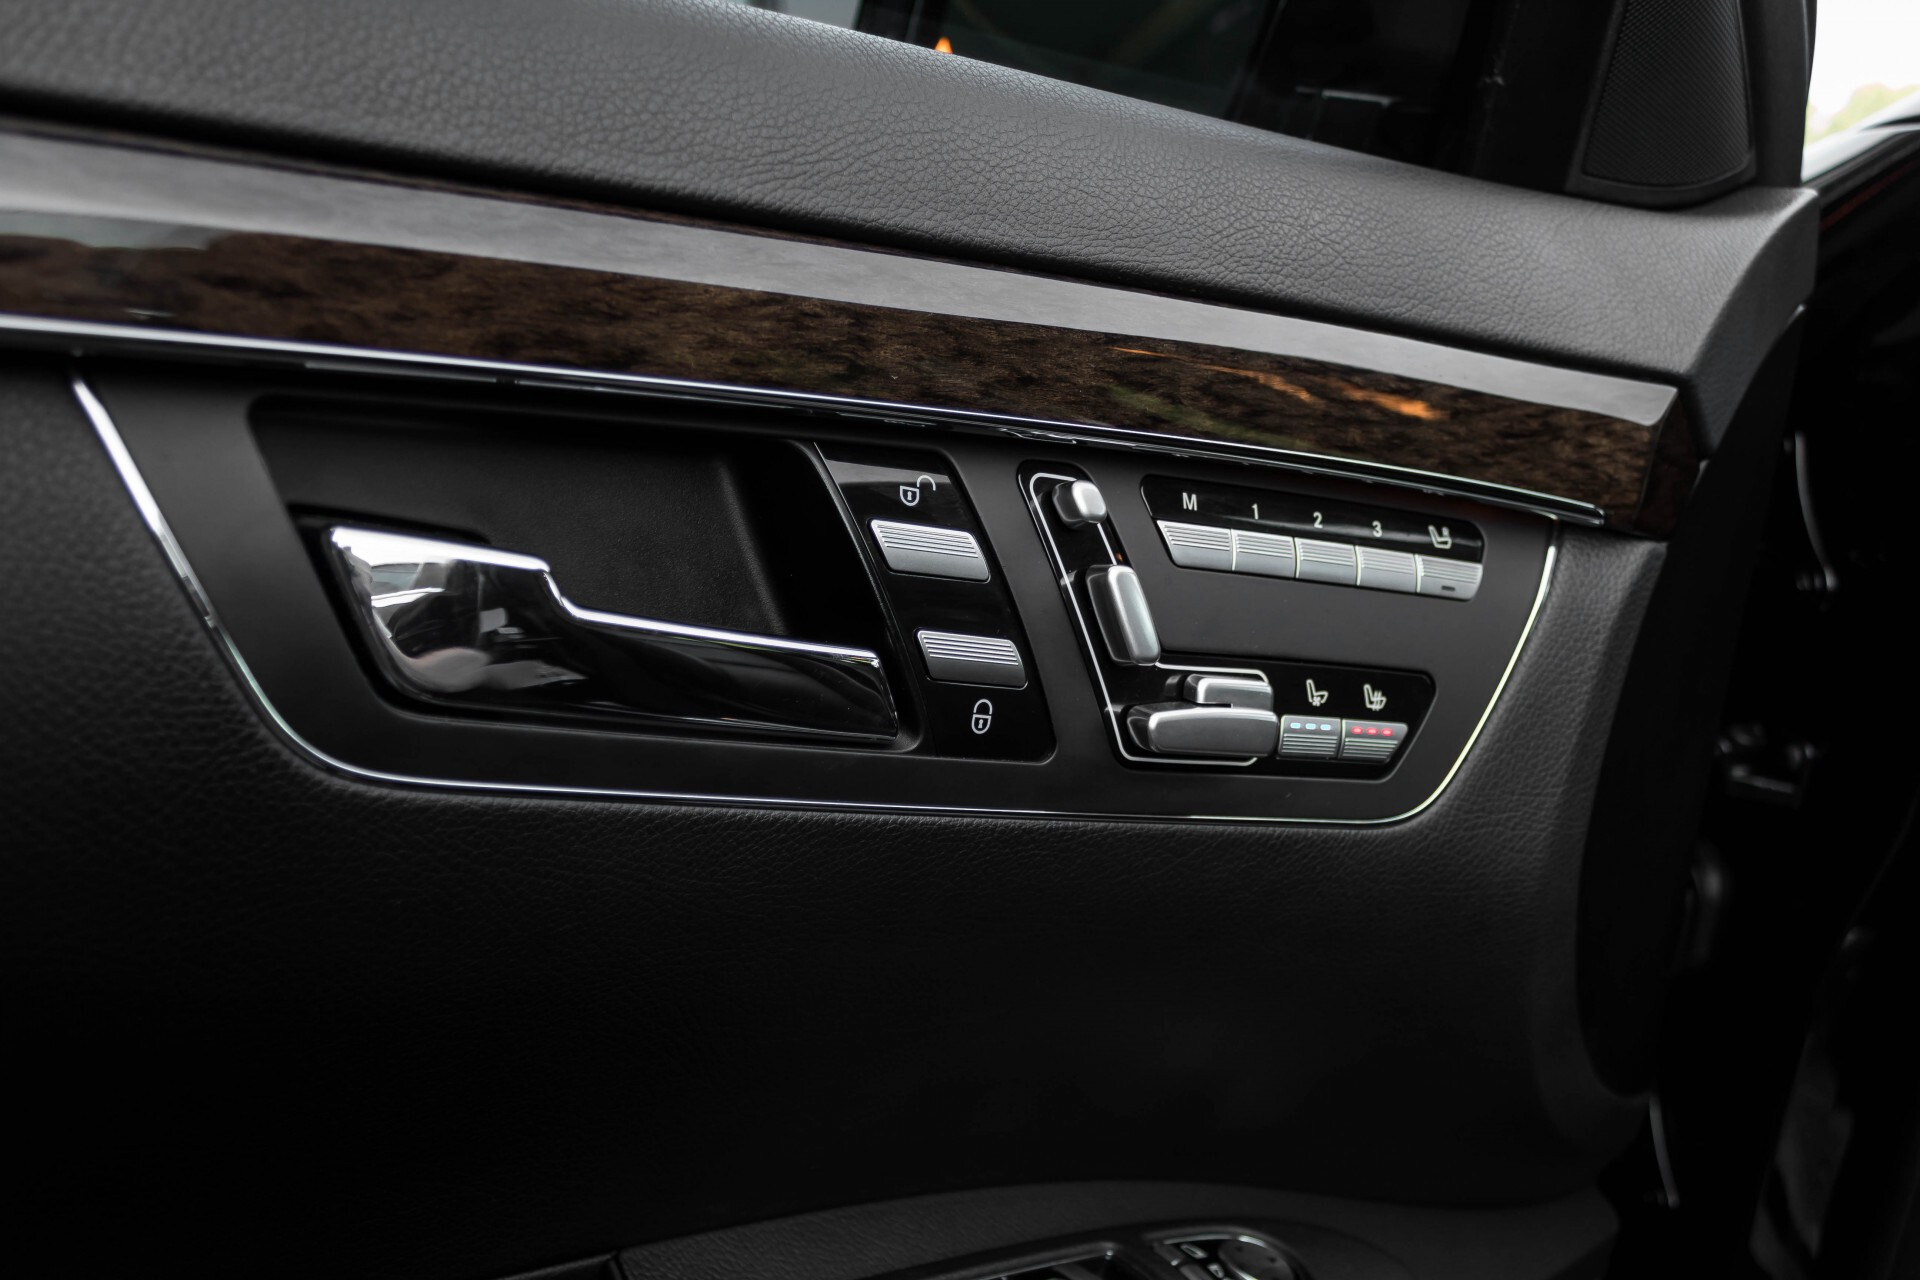 Mercedes-Benz S-Klasse 350 Bluetec Keyless/Distronic/Nightvision/Schuifdak/Harman-Kardon Aut7 Foto 37